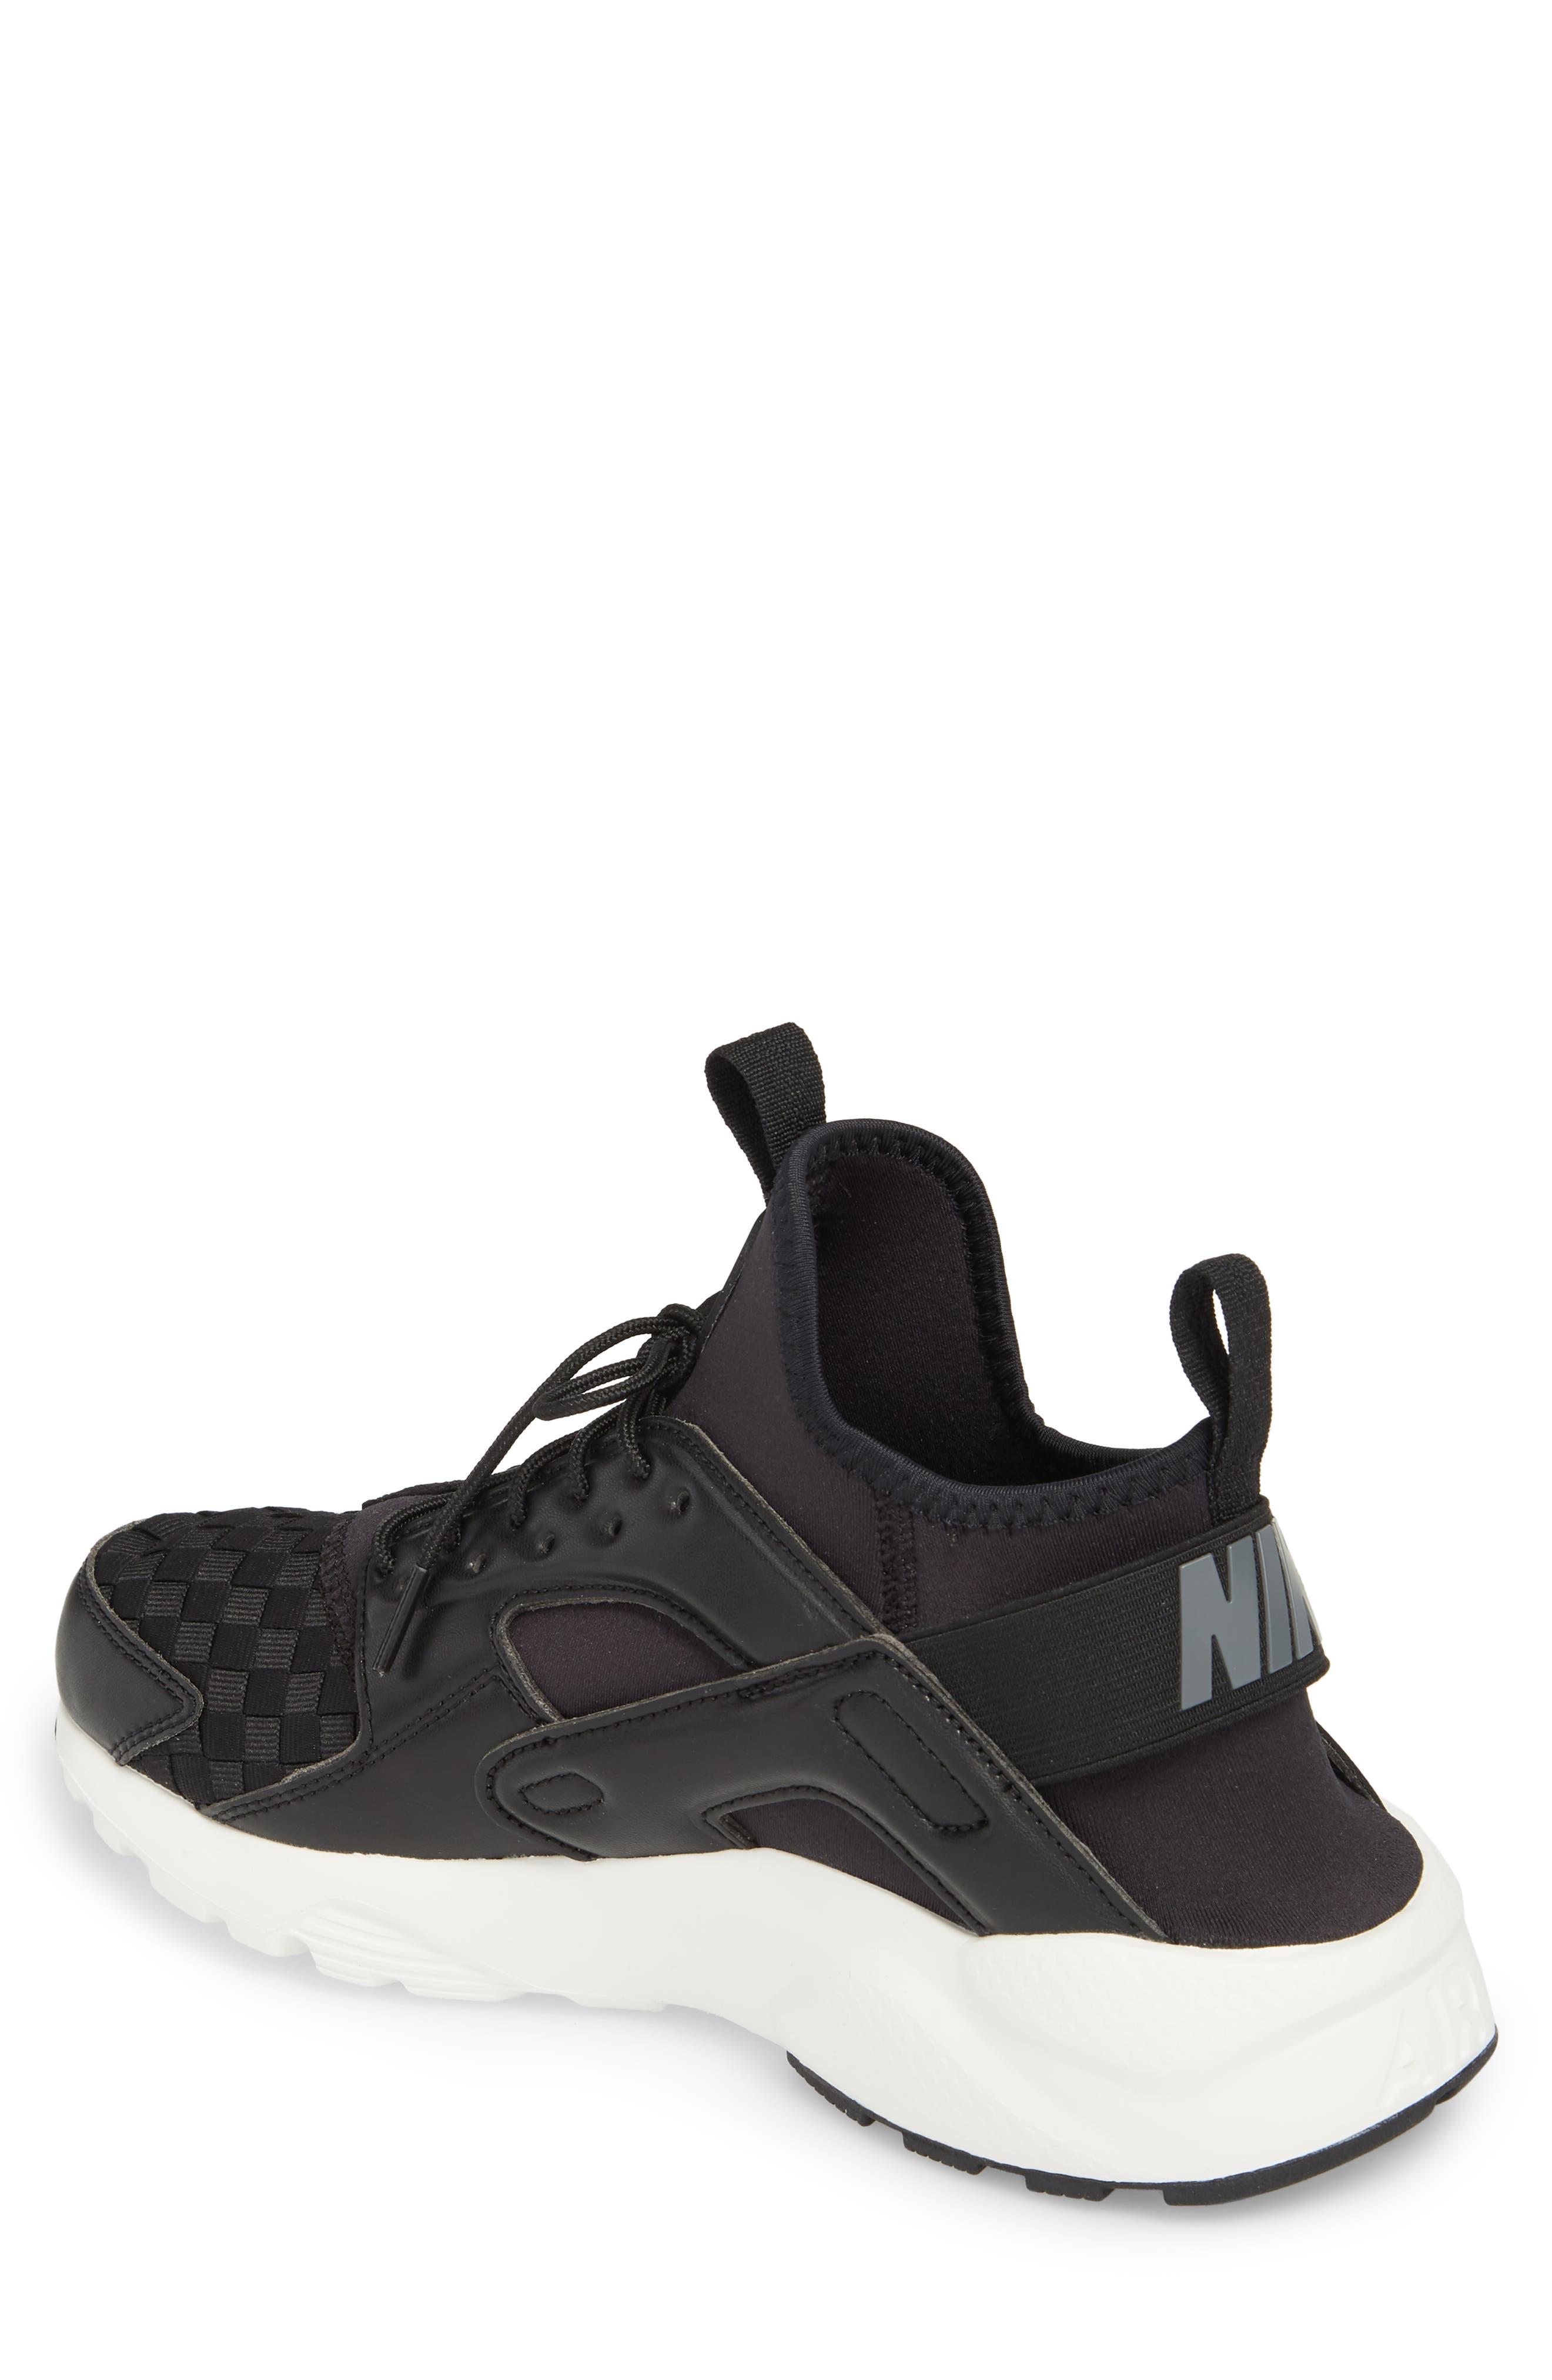 Alternate Image 2  - Nike Air Huarache Run Ultra SE Sneaker (Men)